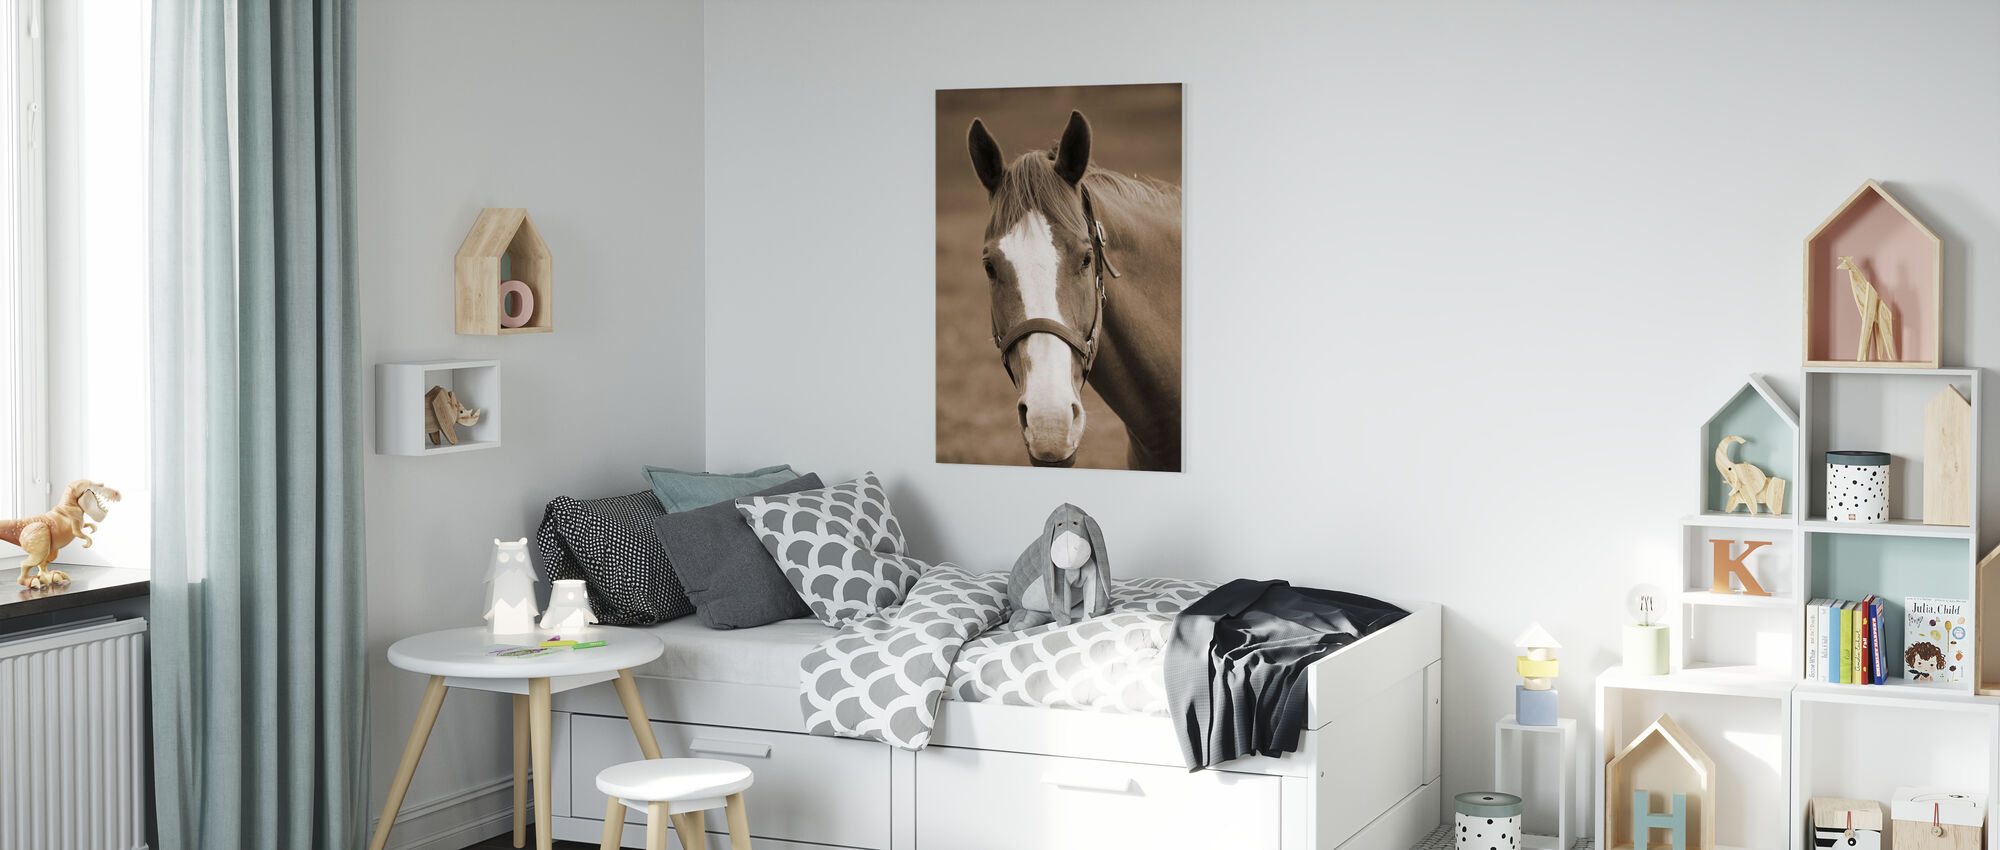 Søt Hest - Lerretsbilde - Barnerom